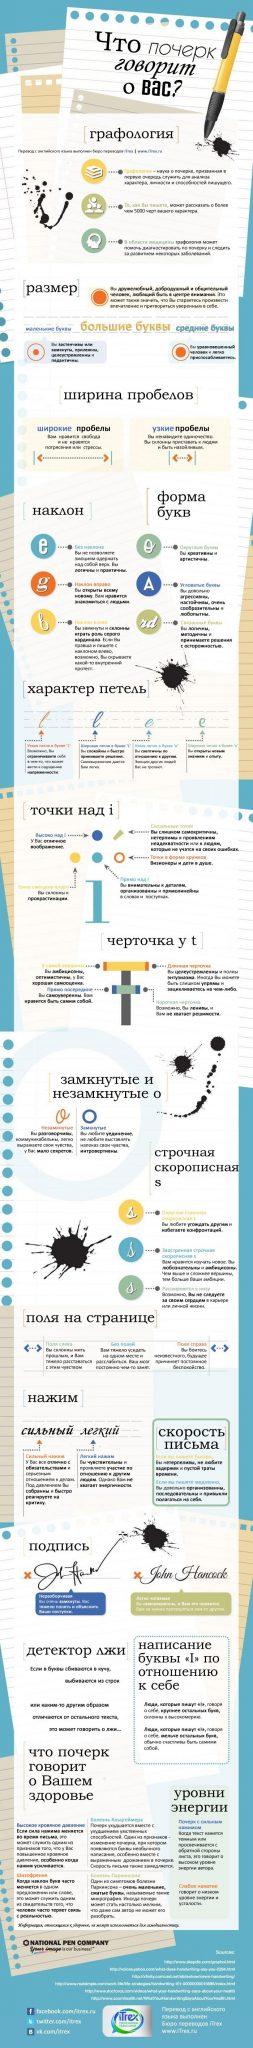 You are currently viewing Что почерк говорит о Вас?